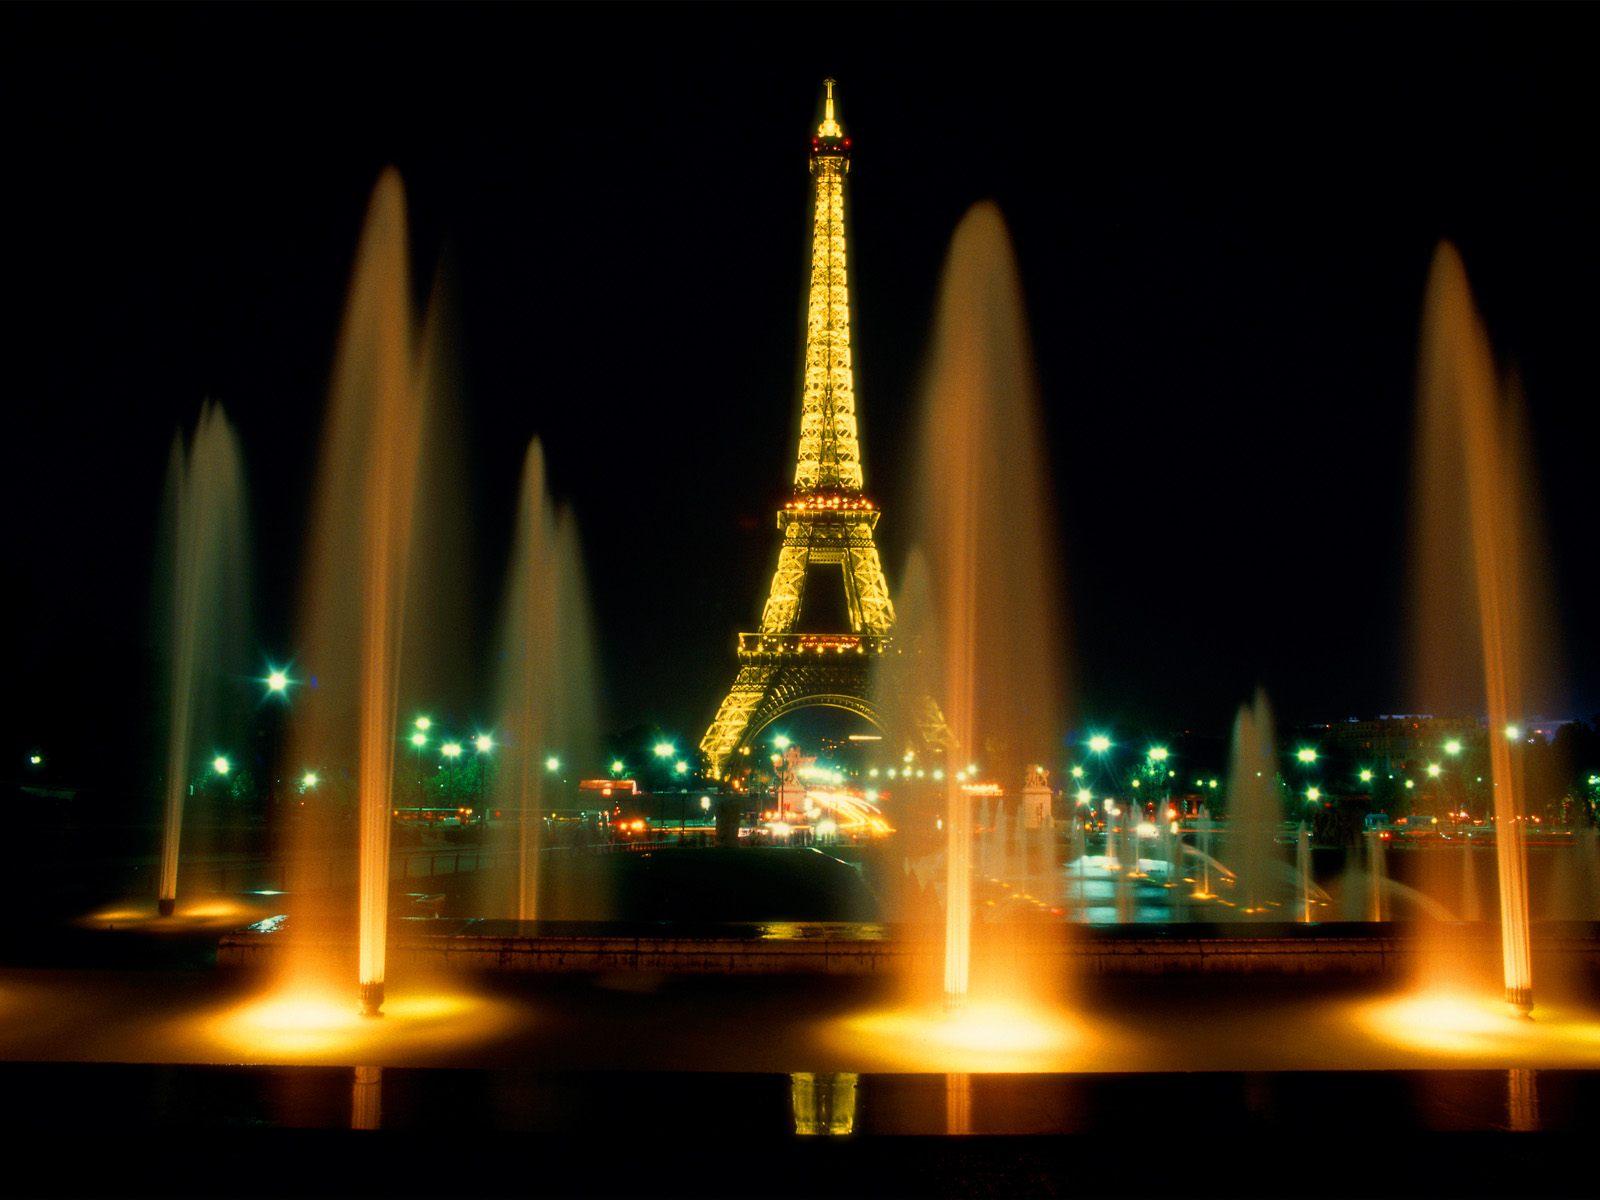 http://4.bp.blogspot.com/_G3JHNPplIHw/TIHQxWtjhII/AAAAAAAAABk/eVfLihMA2oE/s1600/Eiffel_Tower,_Night.jpg